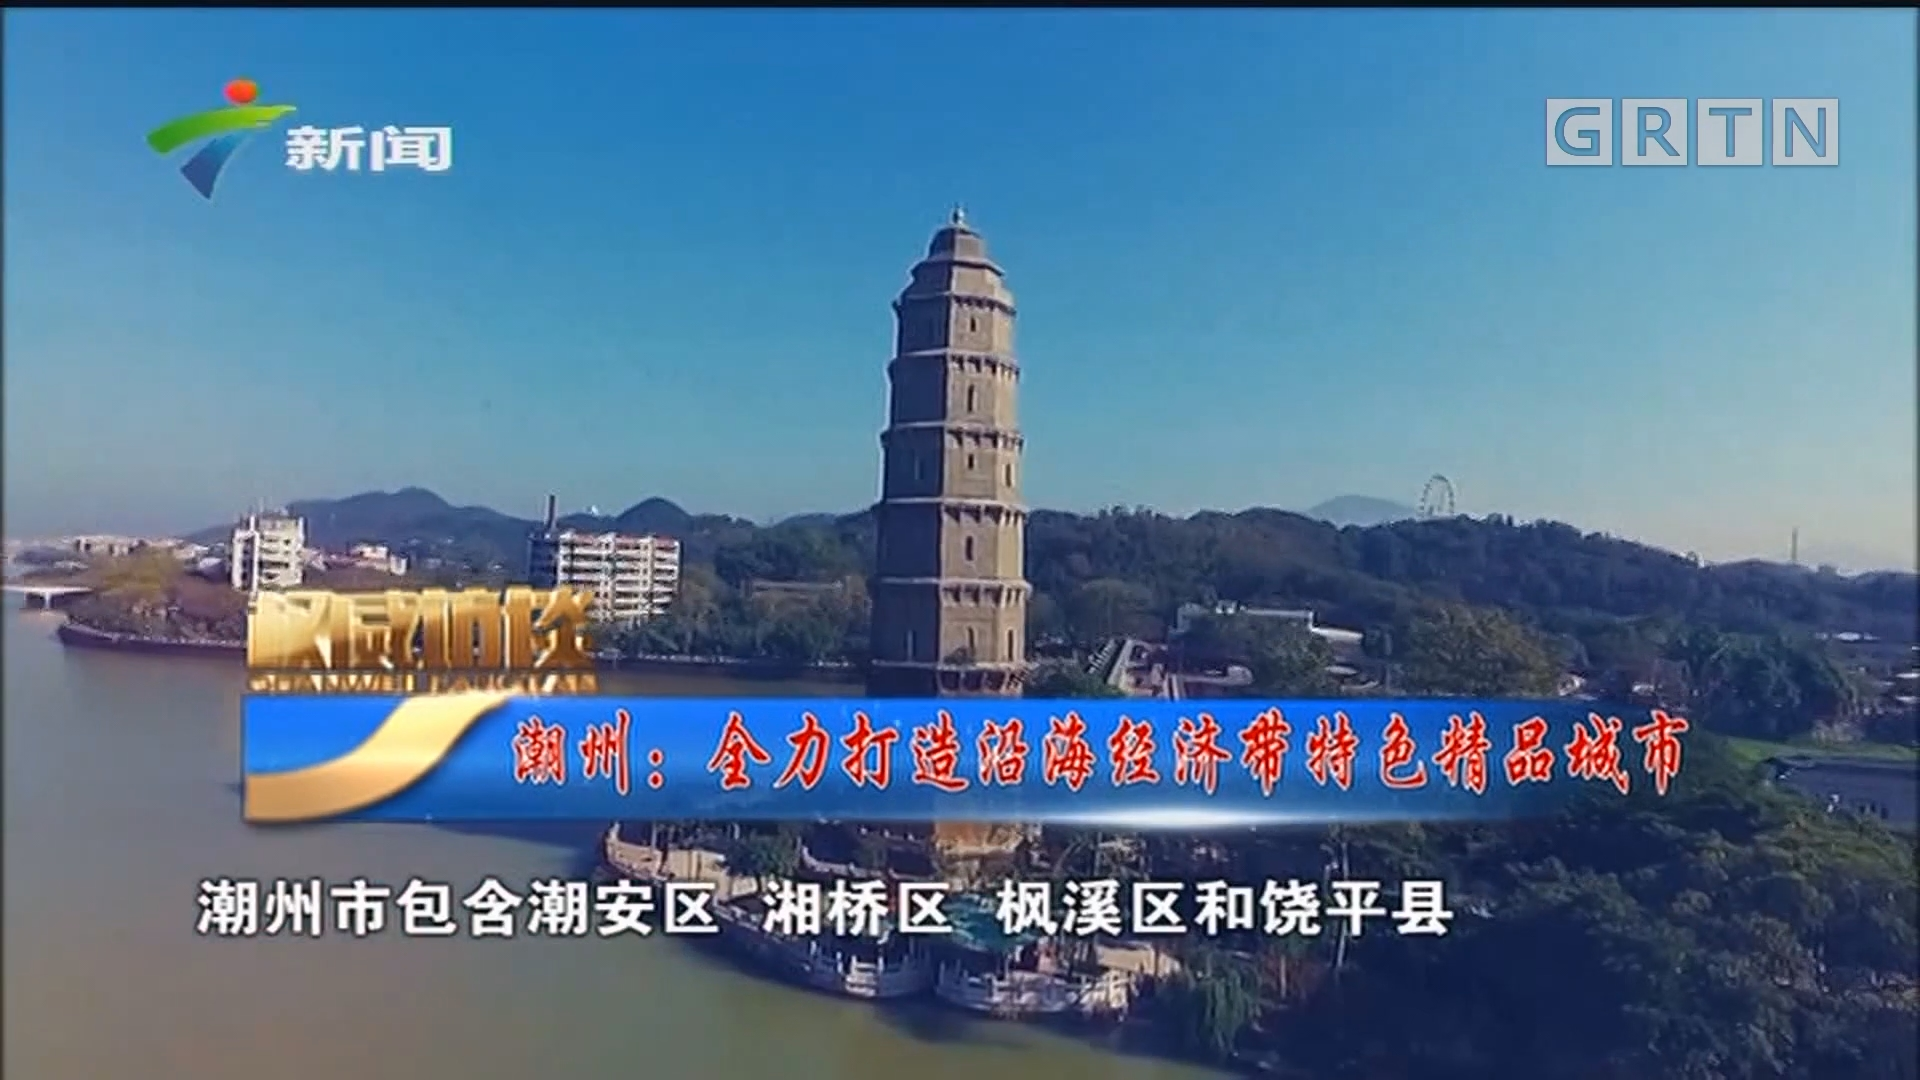 [HD][2019-09-08]权威访谈:潮州:全力打造沿海经济带特色精品城市